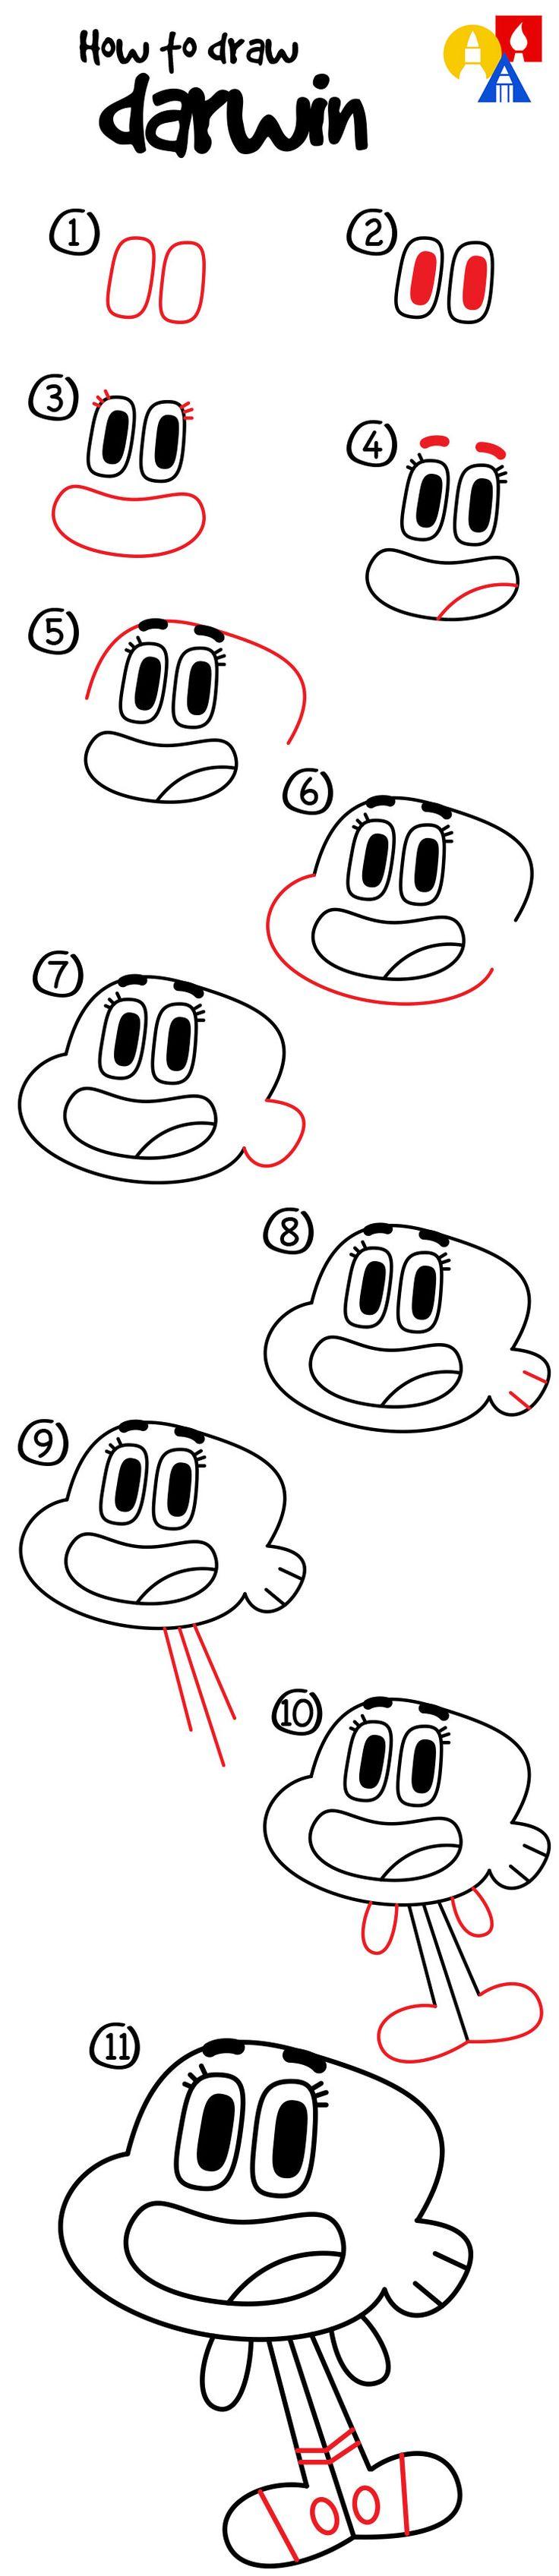 Learn how to draw Darwin!